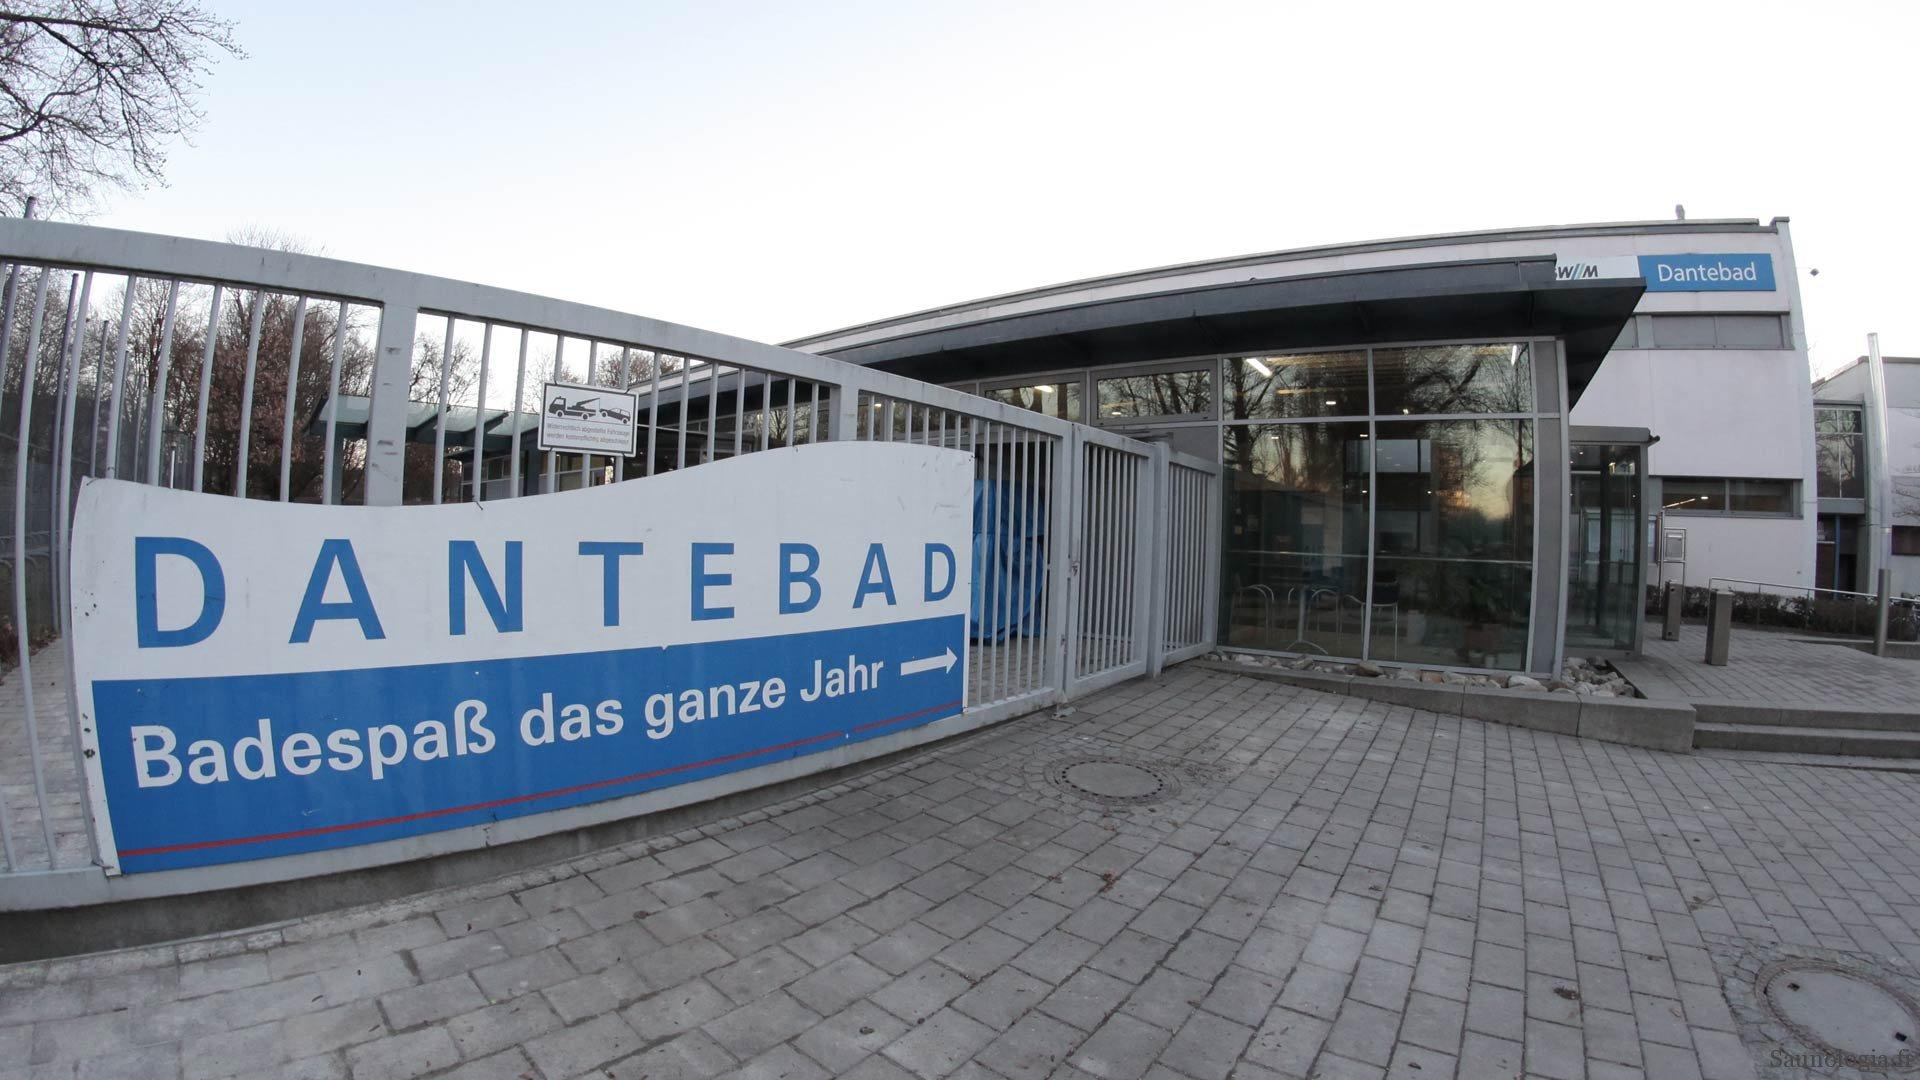 170507-Dantebad-ulkoa_8482